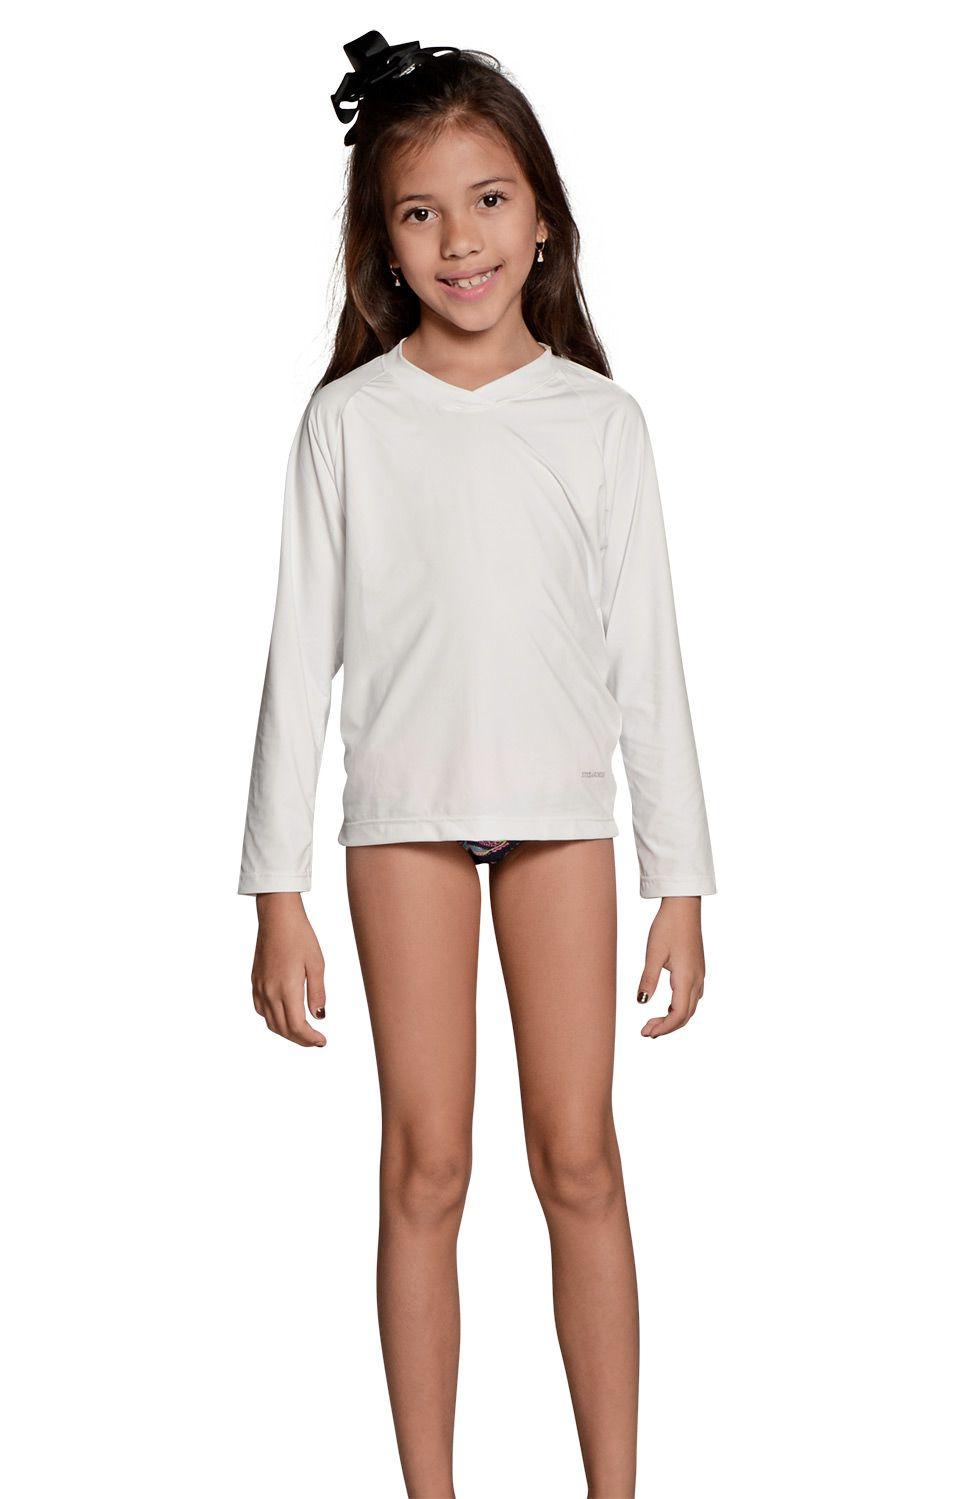 Camiseta Uv Praia Infantil Branca